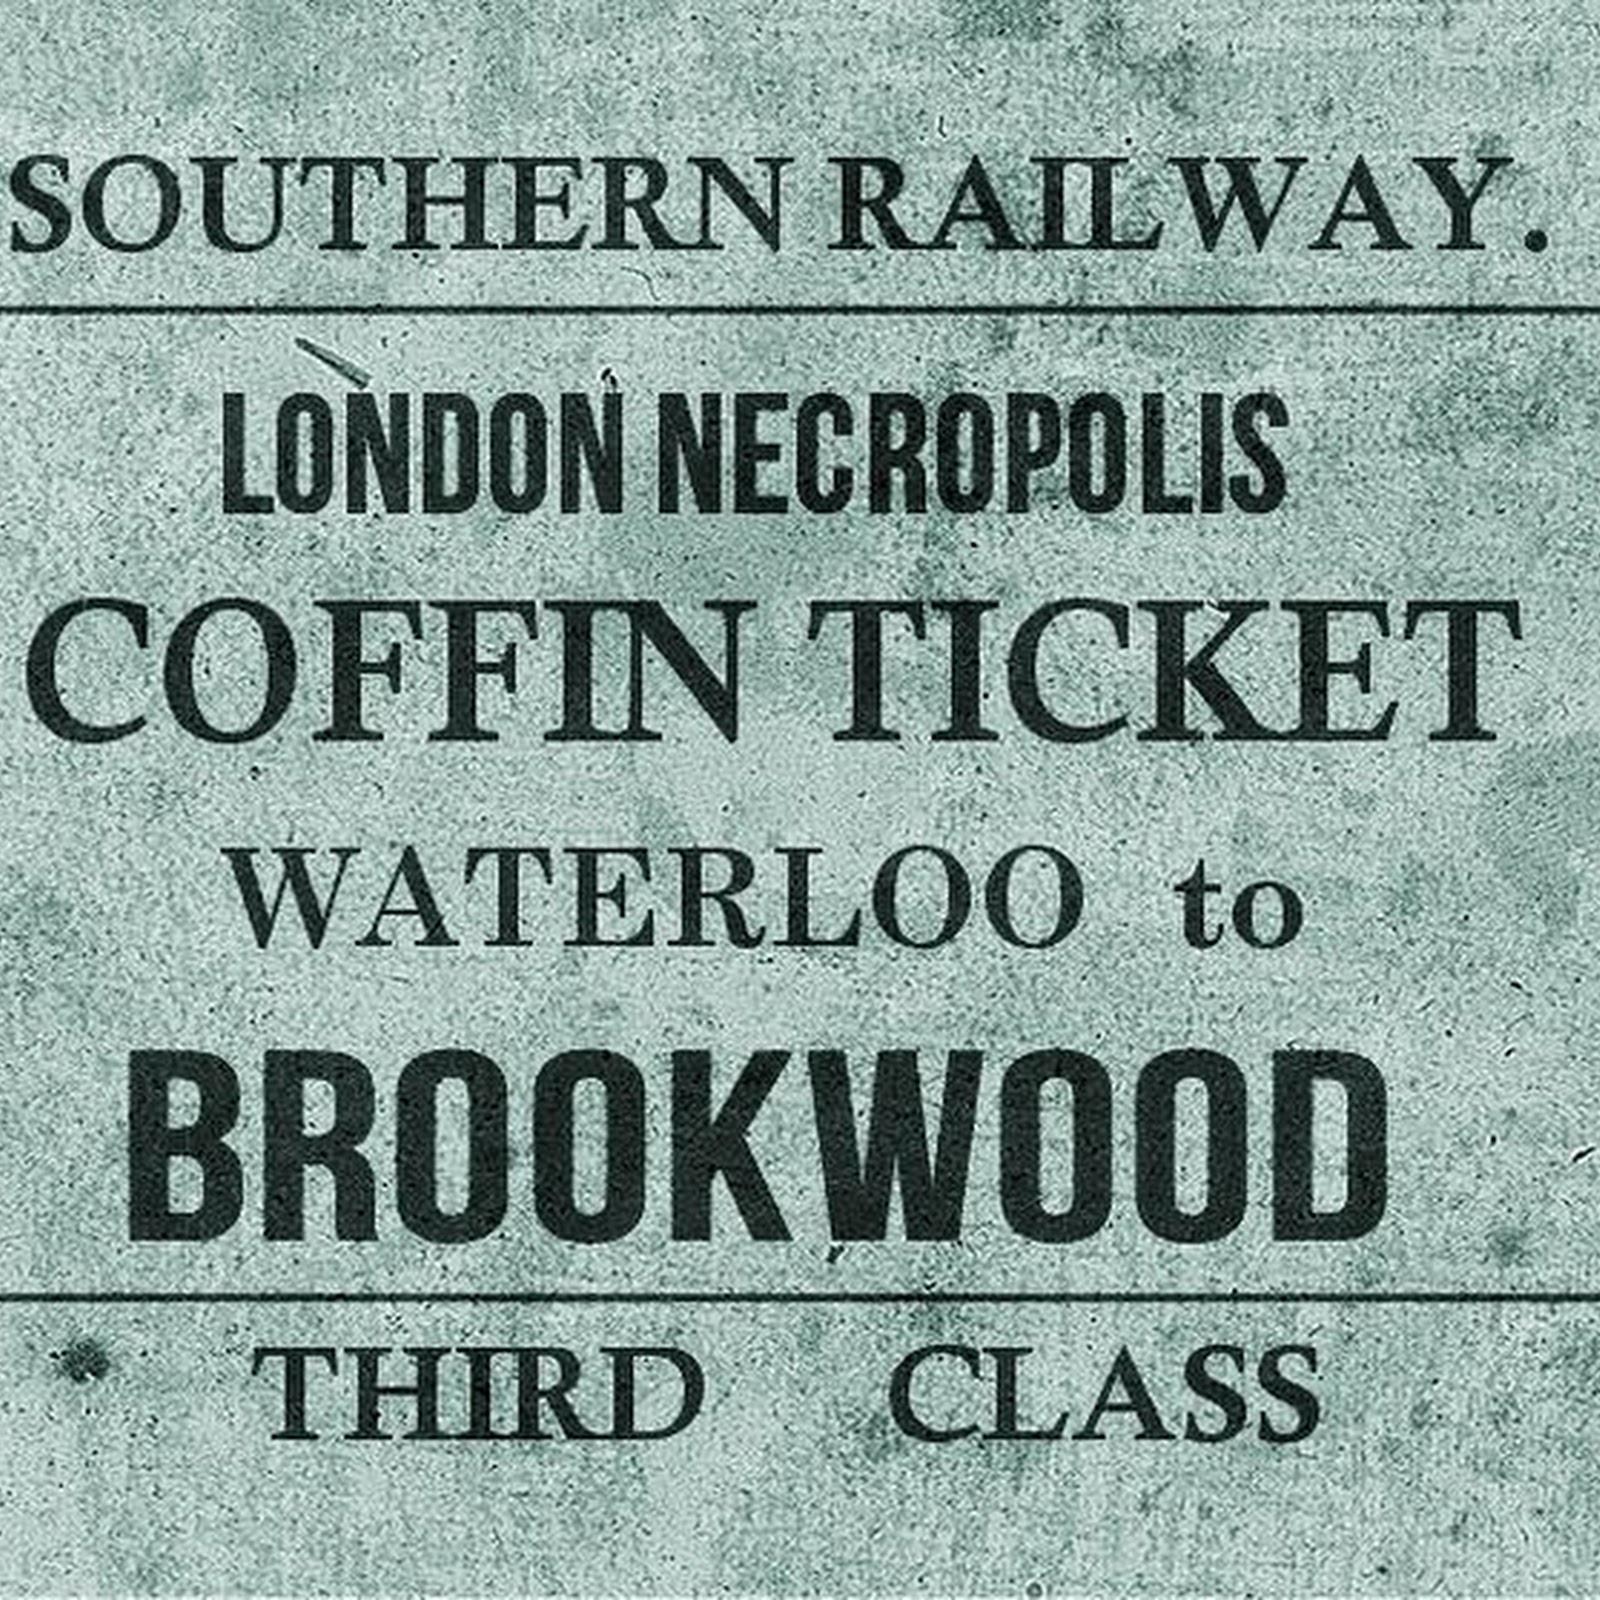 London Necropolis Railway: The Train For The Dead